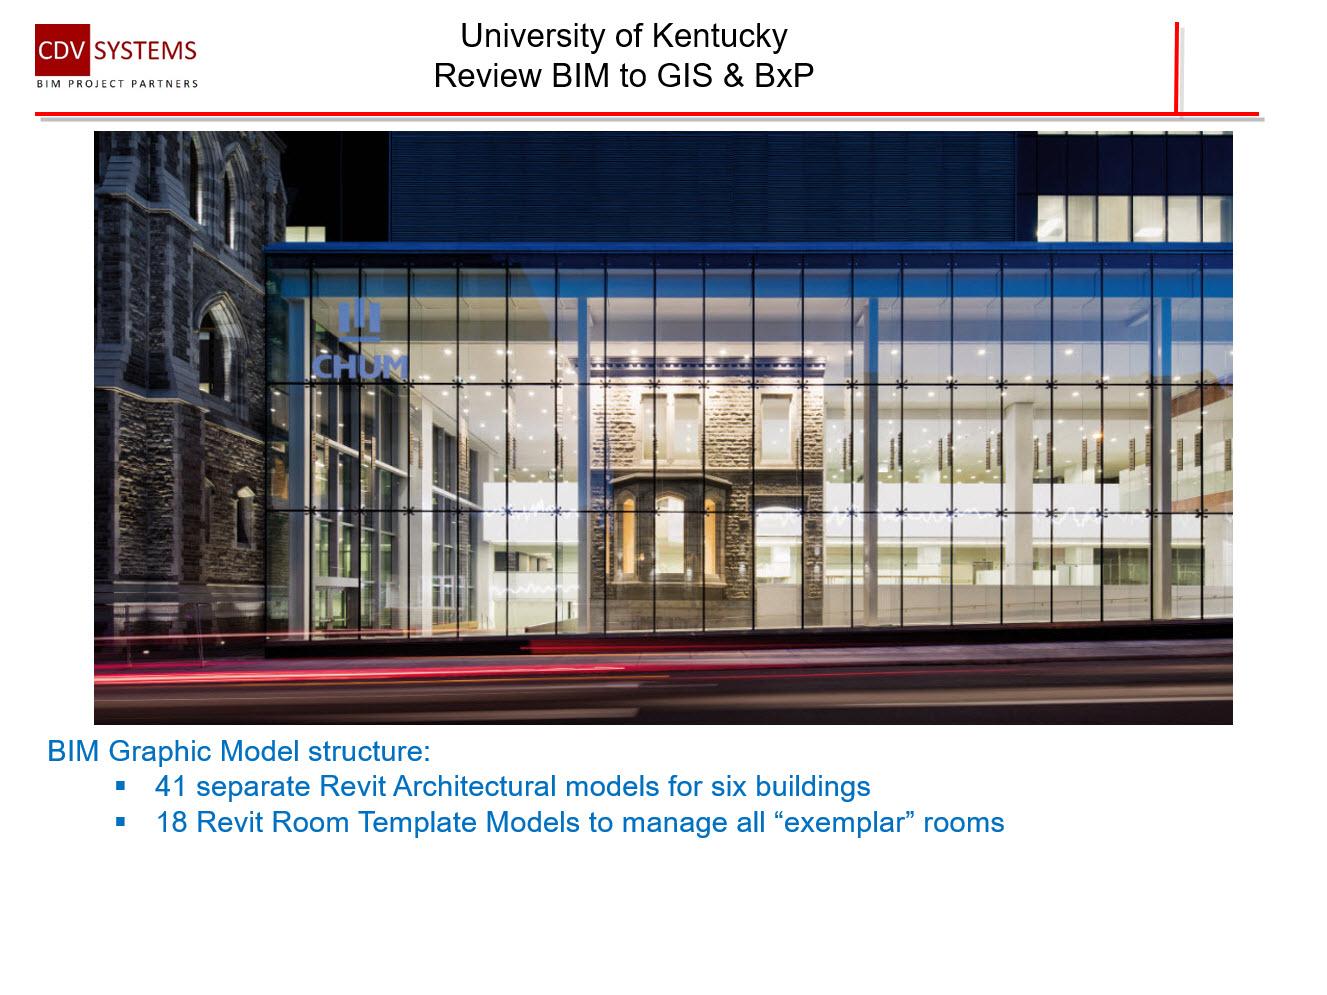 University of Kentucky_001u.jpg